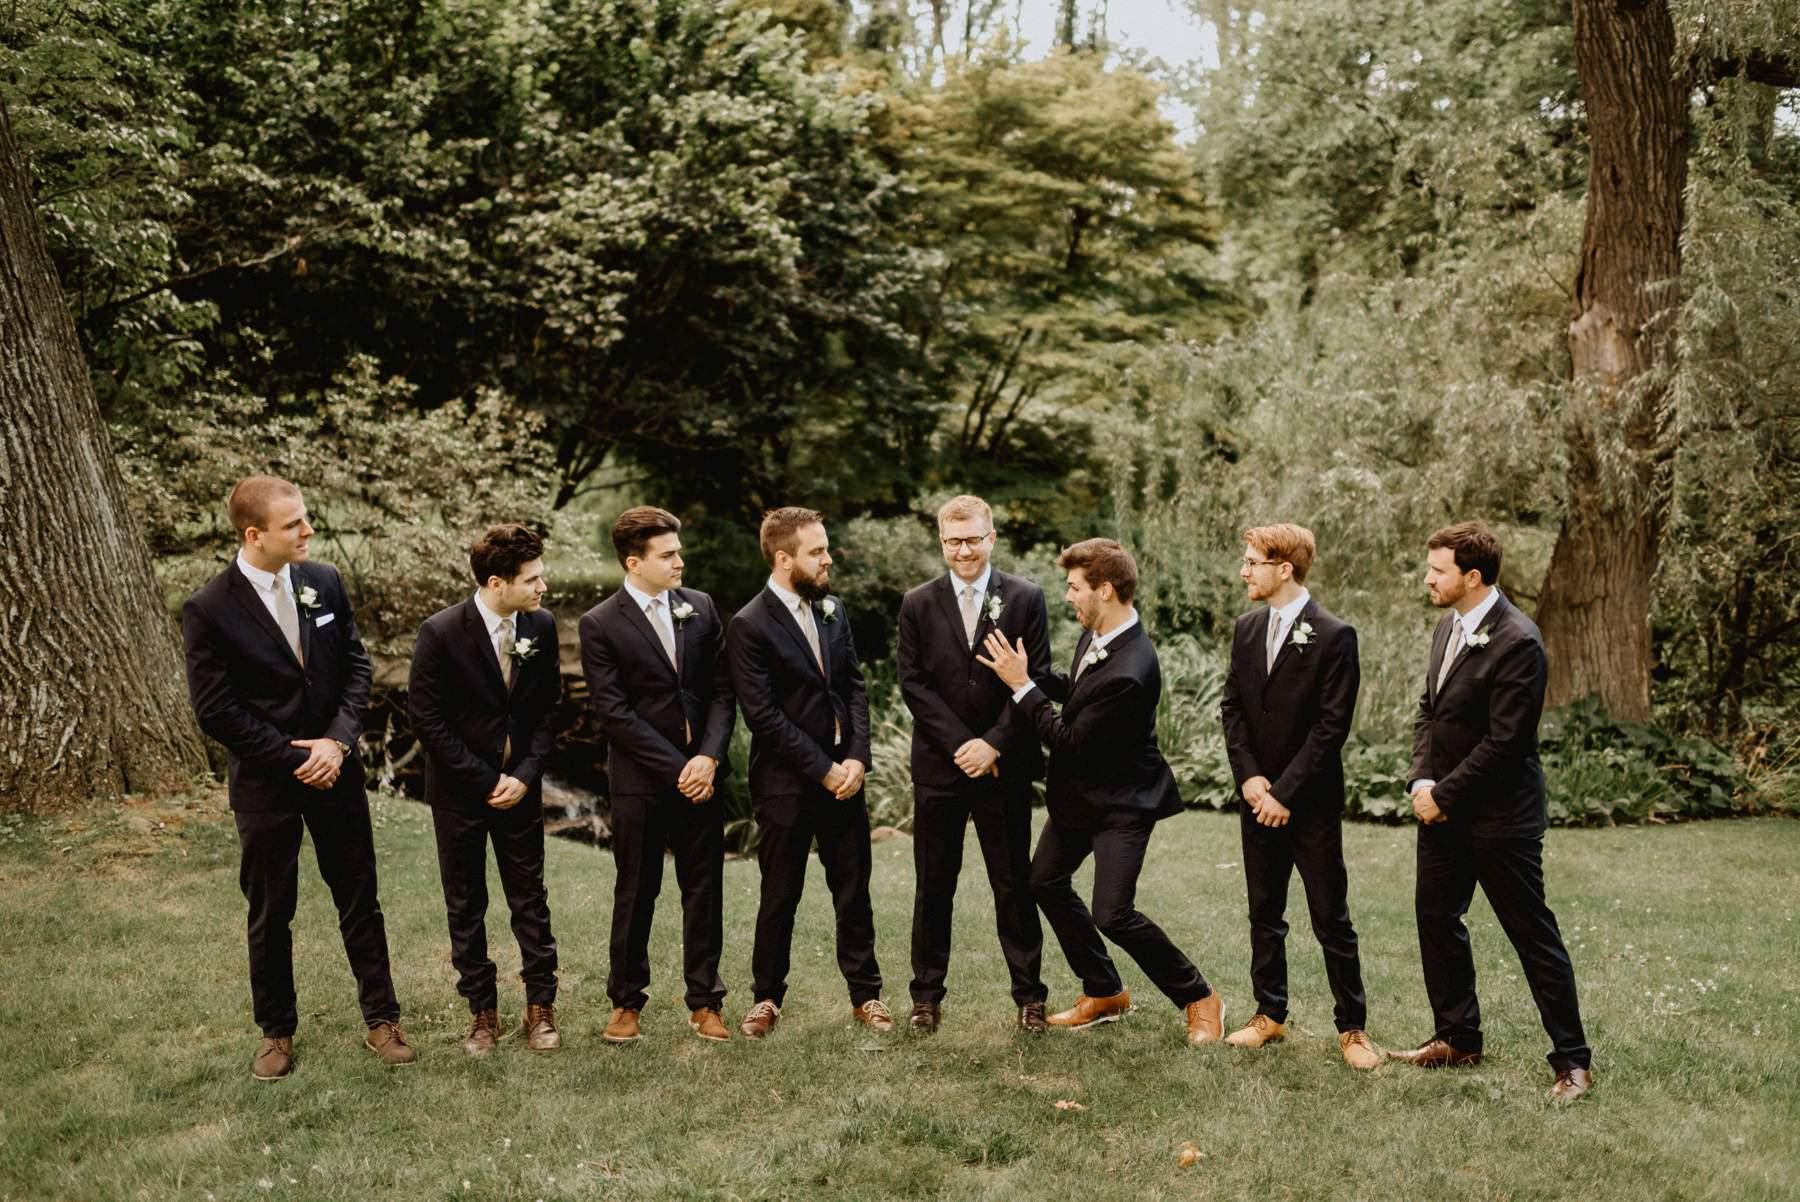 Appleford-estate-wedding-39.jpg